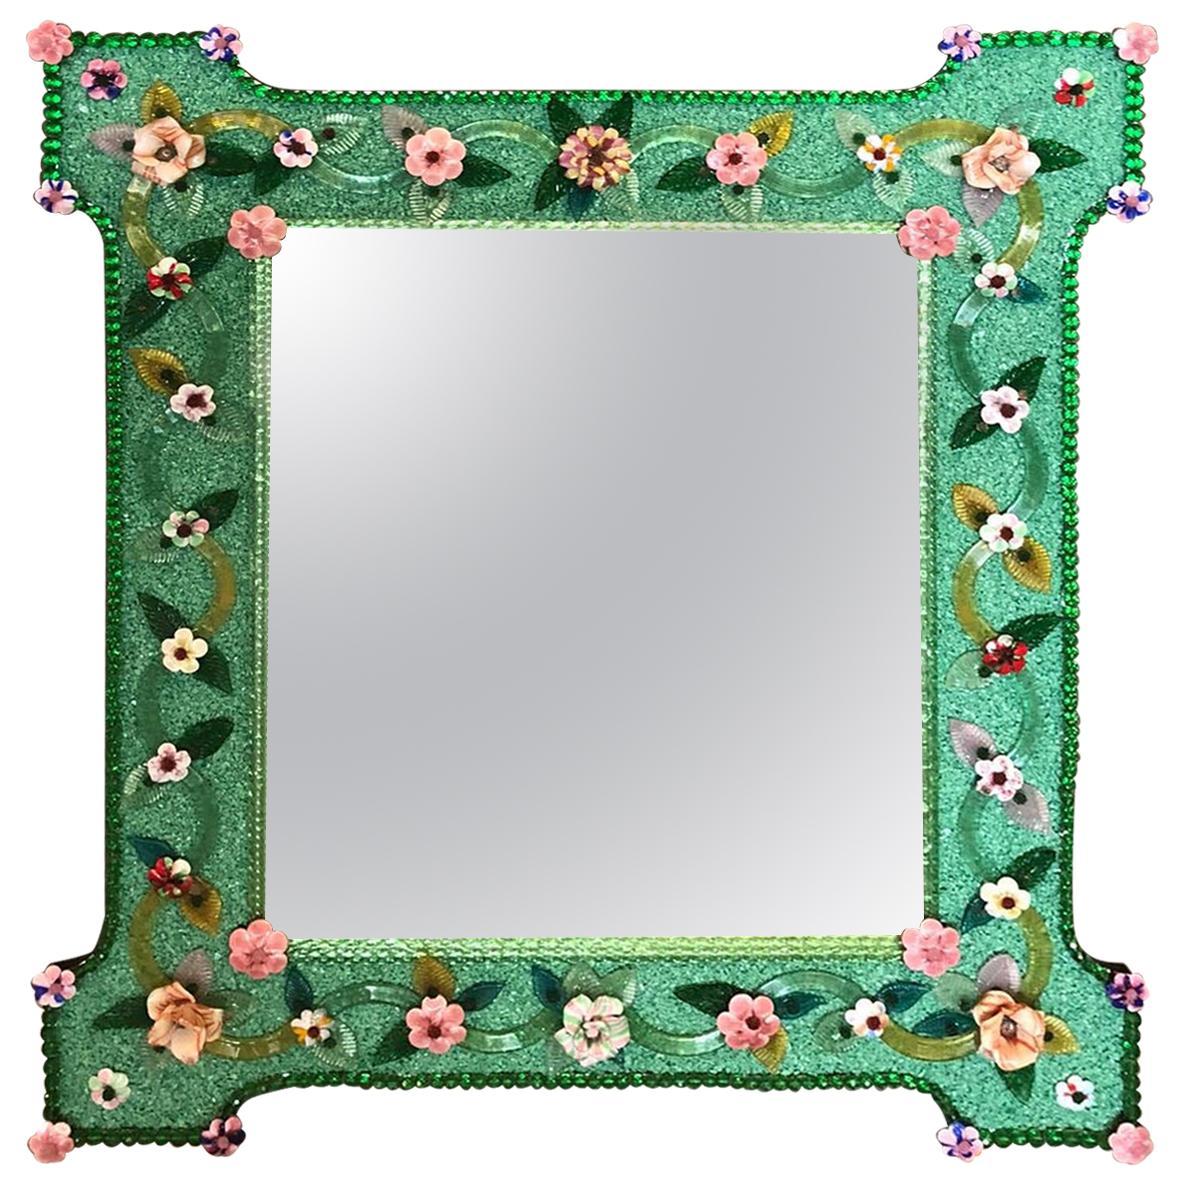 Delicious Venetian Murano Glass Mirror with Multicolor Flowers